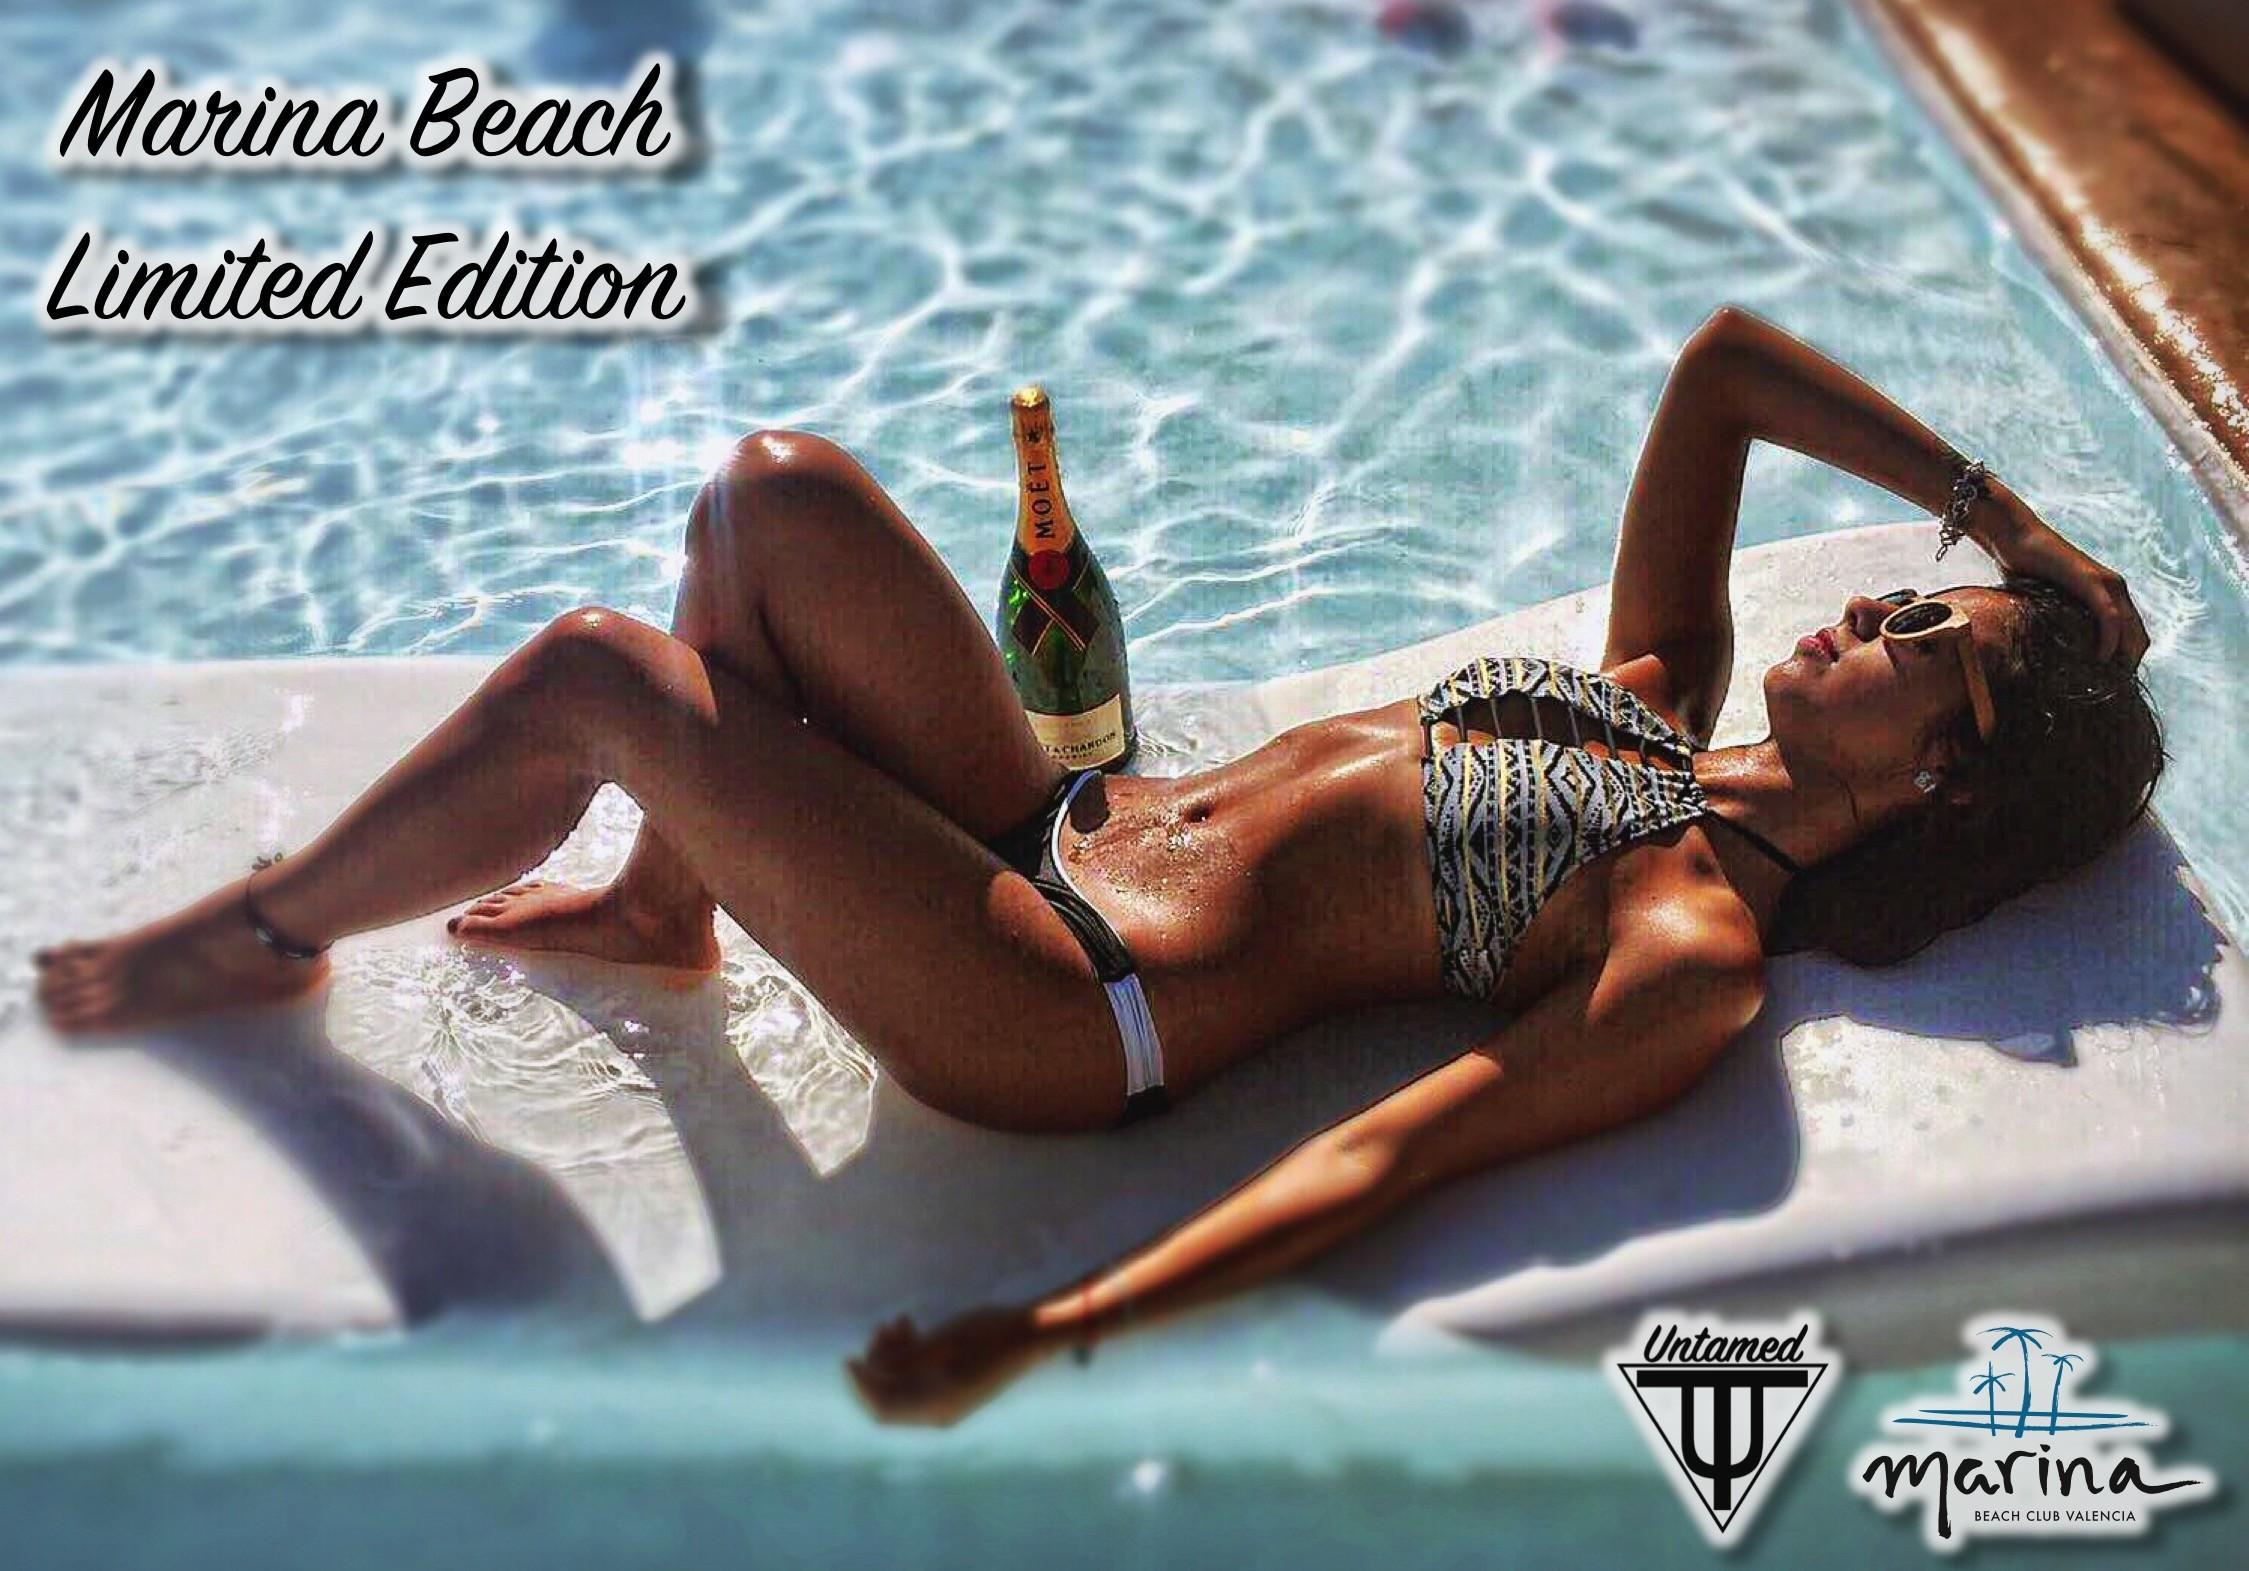 Handmade Wood Sunglasses - Untamed World x Marina Beach Club Valencia